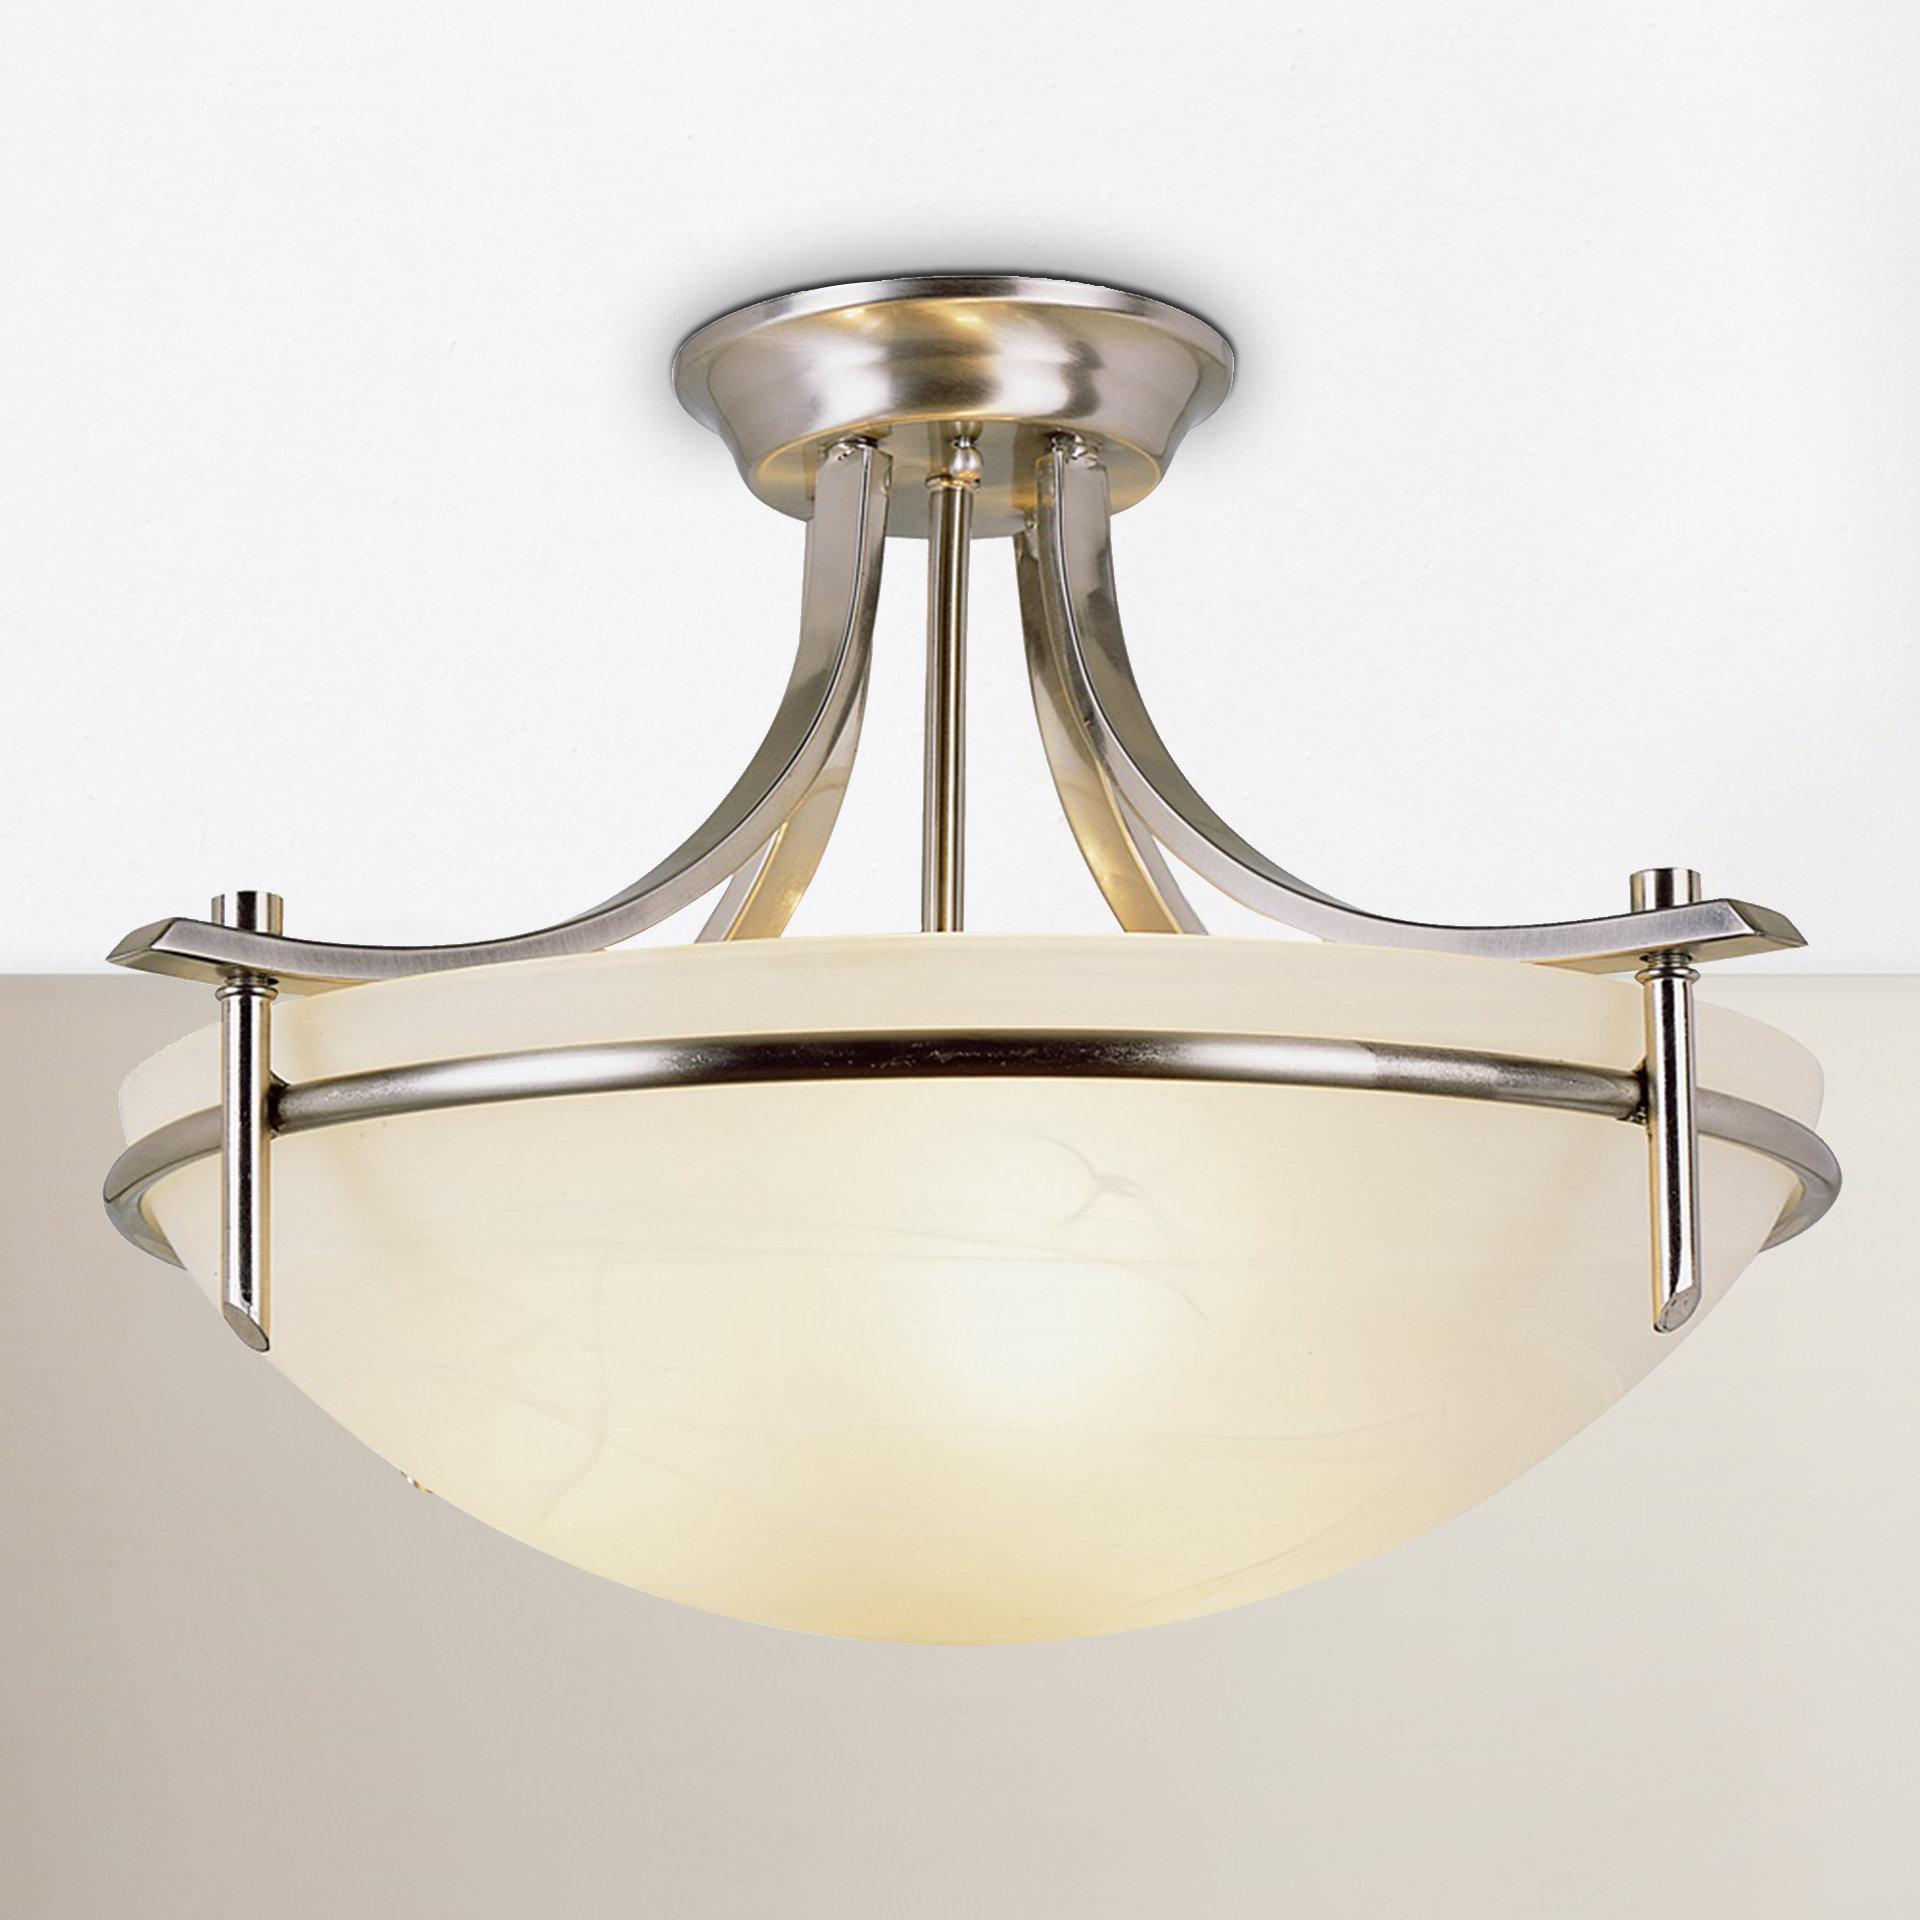 Ferrante 3 Light Semi Flush Mount Regarding Warner Robins 3 Light Lantern Pendants (View 4 of 30)